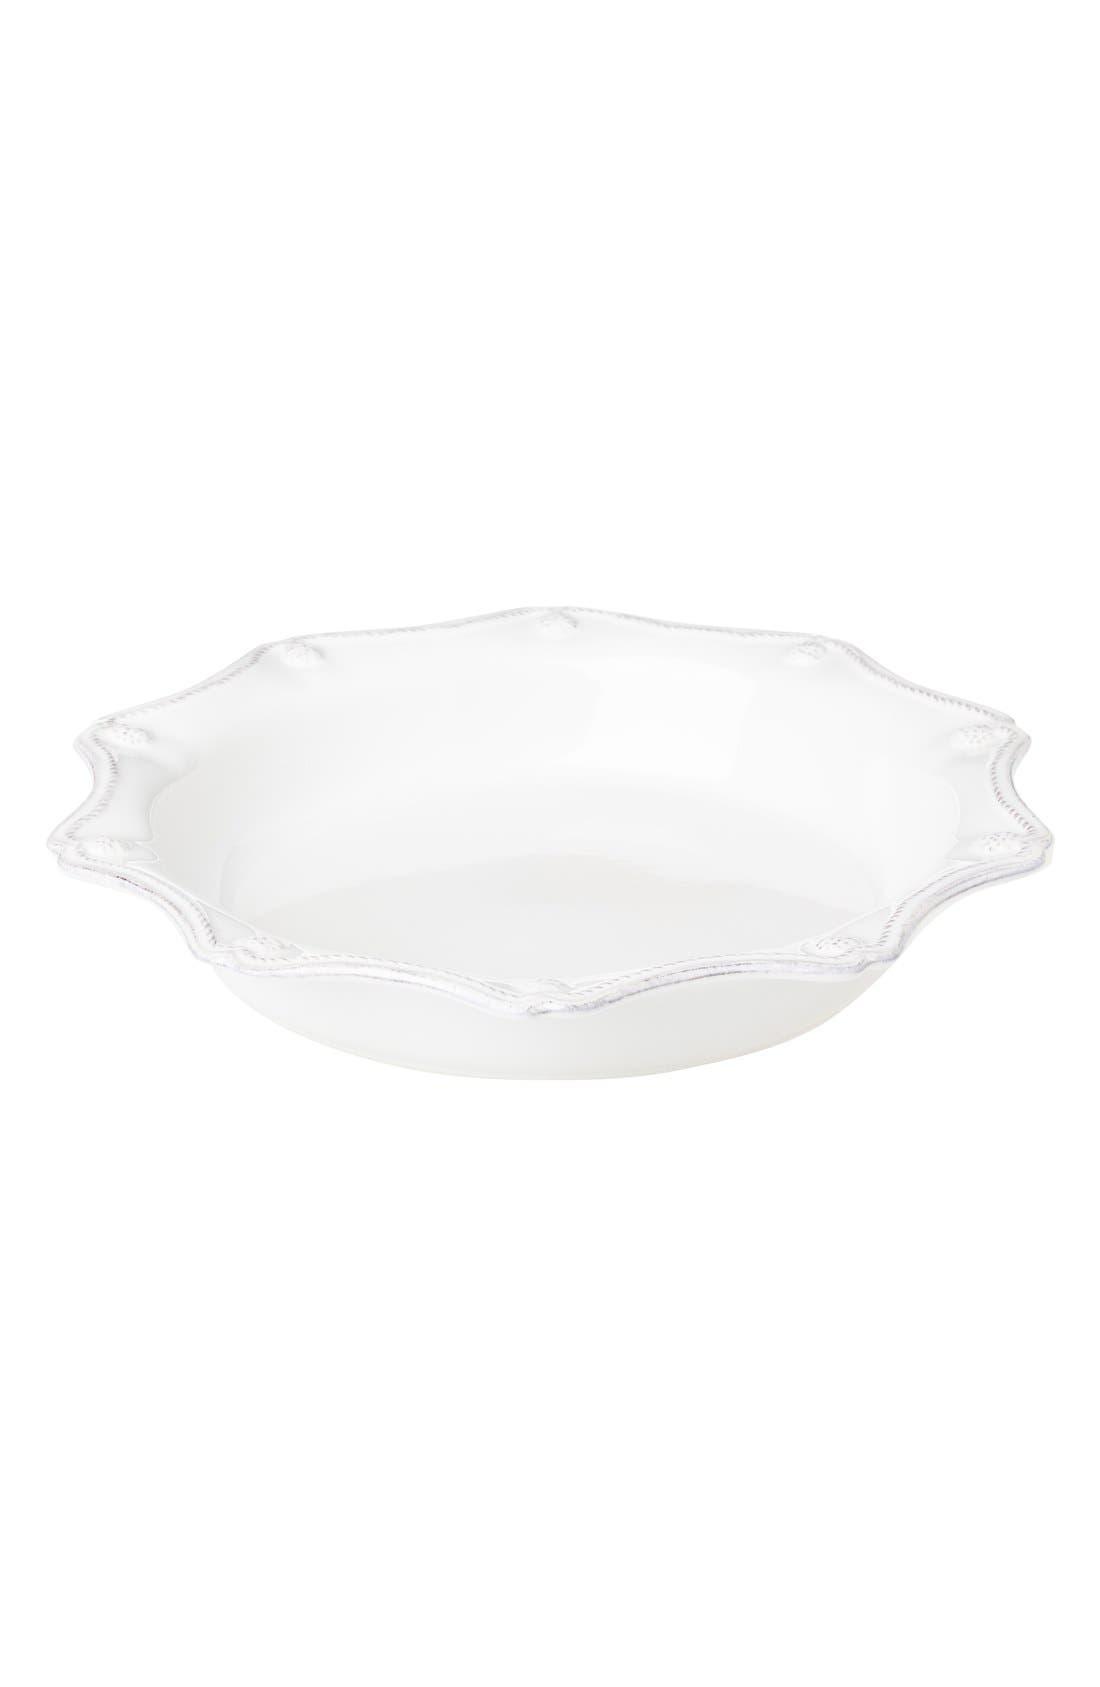 'Berry and Thread' Ceramic Pie Dish,                         Main,                         color, Whitewash